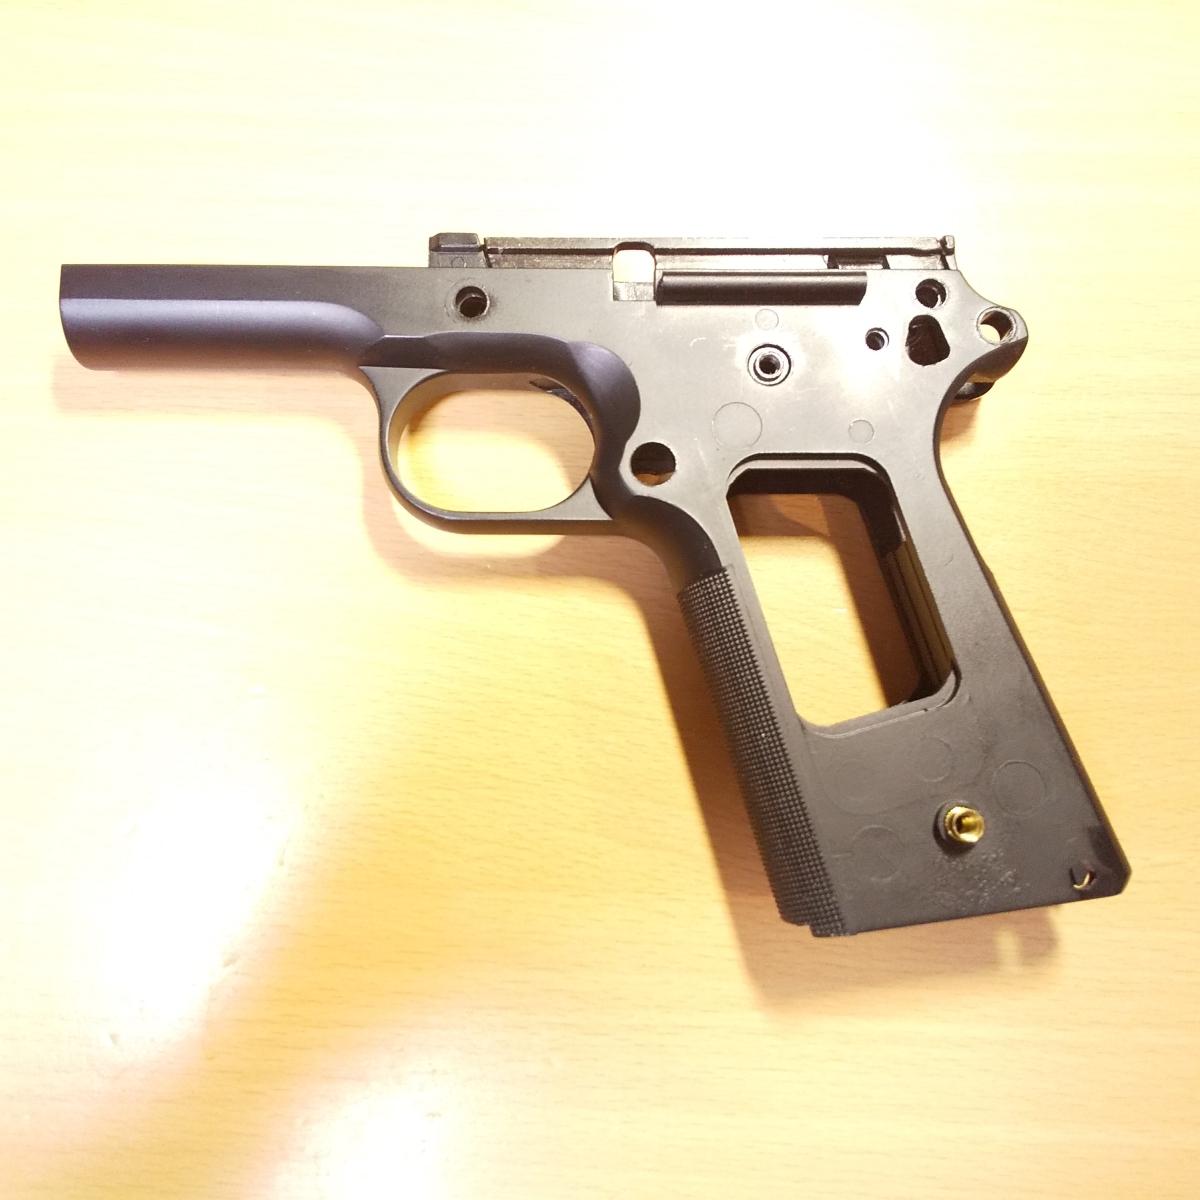 WA SCW キンバー LAPD SWAT CUSTOM II Ver.3 HW フレーム アッセンブリー 一式/1911 ガバメント MEU コルト ウイルソン Prime